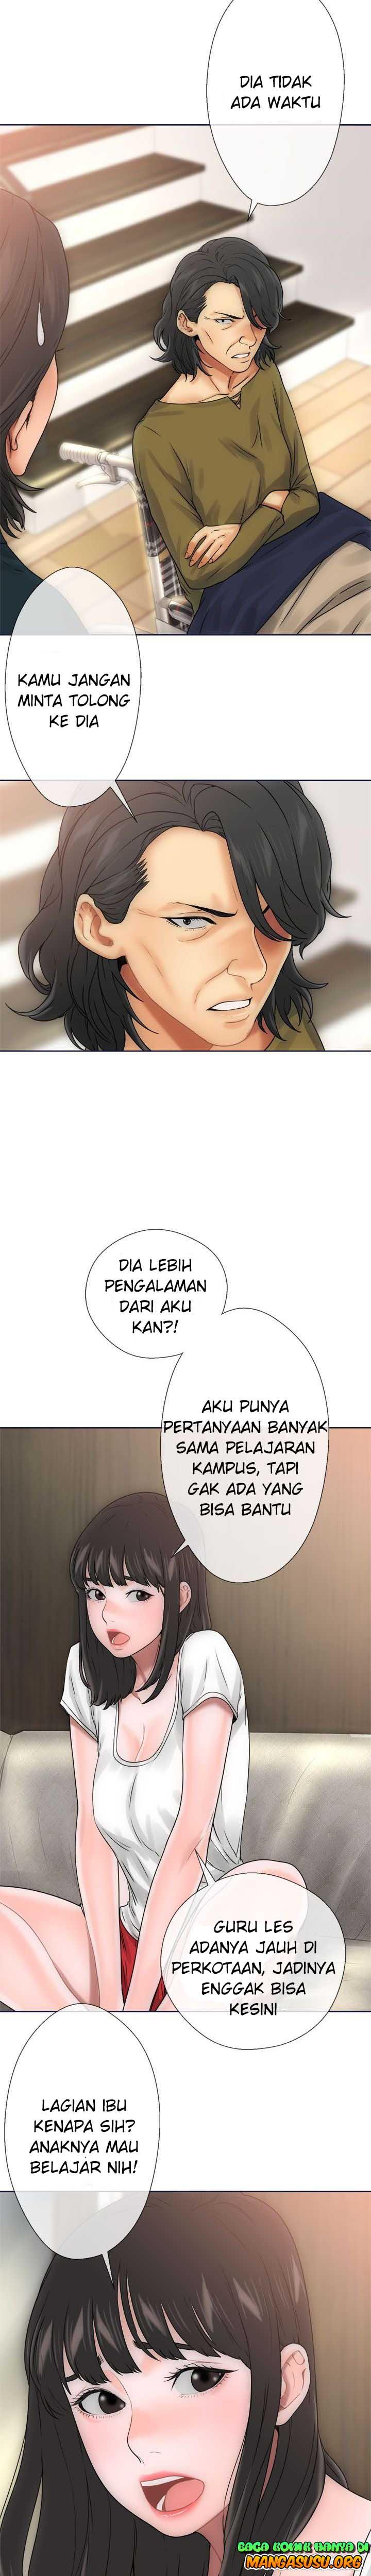 Lust Awakening Chapter 9 Bahasa Indonesia